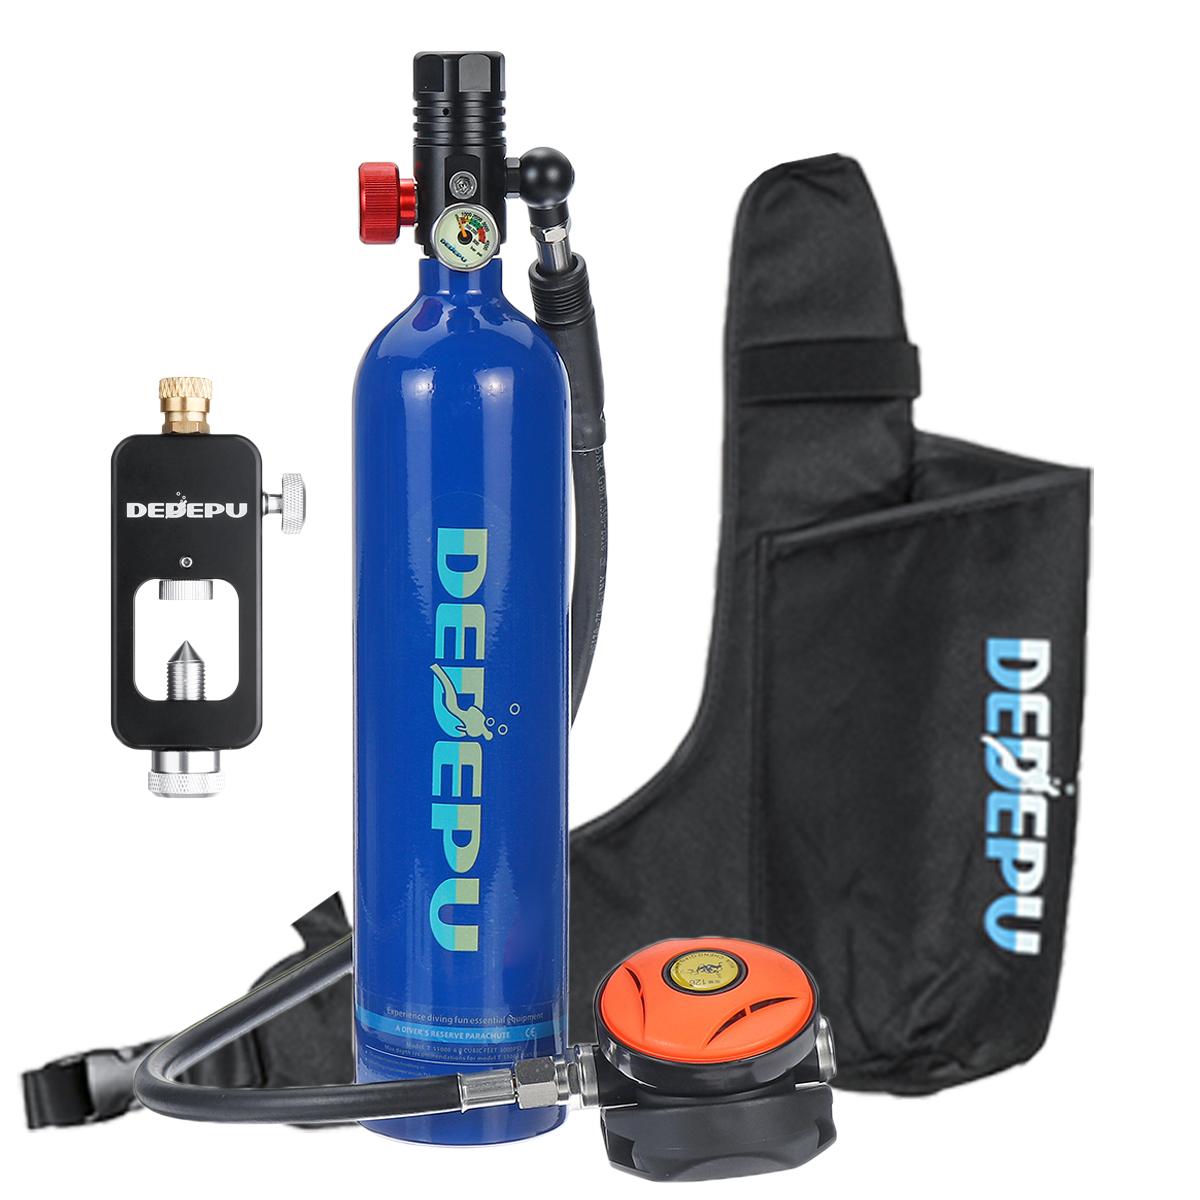 DEDEPU Scuba Diving Set 1L Diving Tank With Scuba Converter+Storage Bag Underwater Mini Scuba Tank Accessories